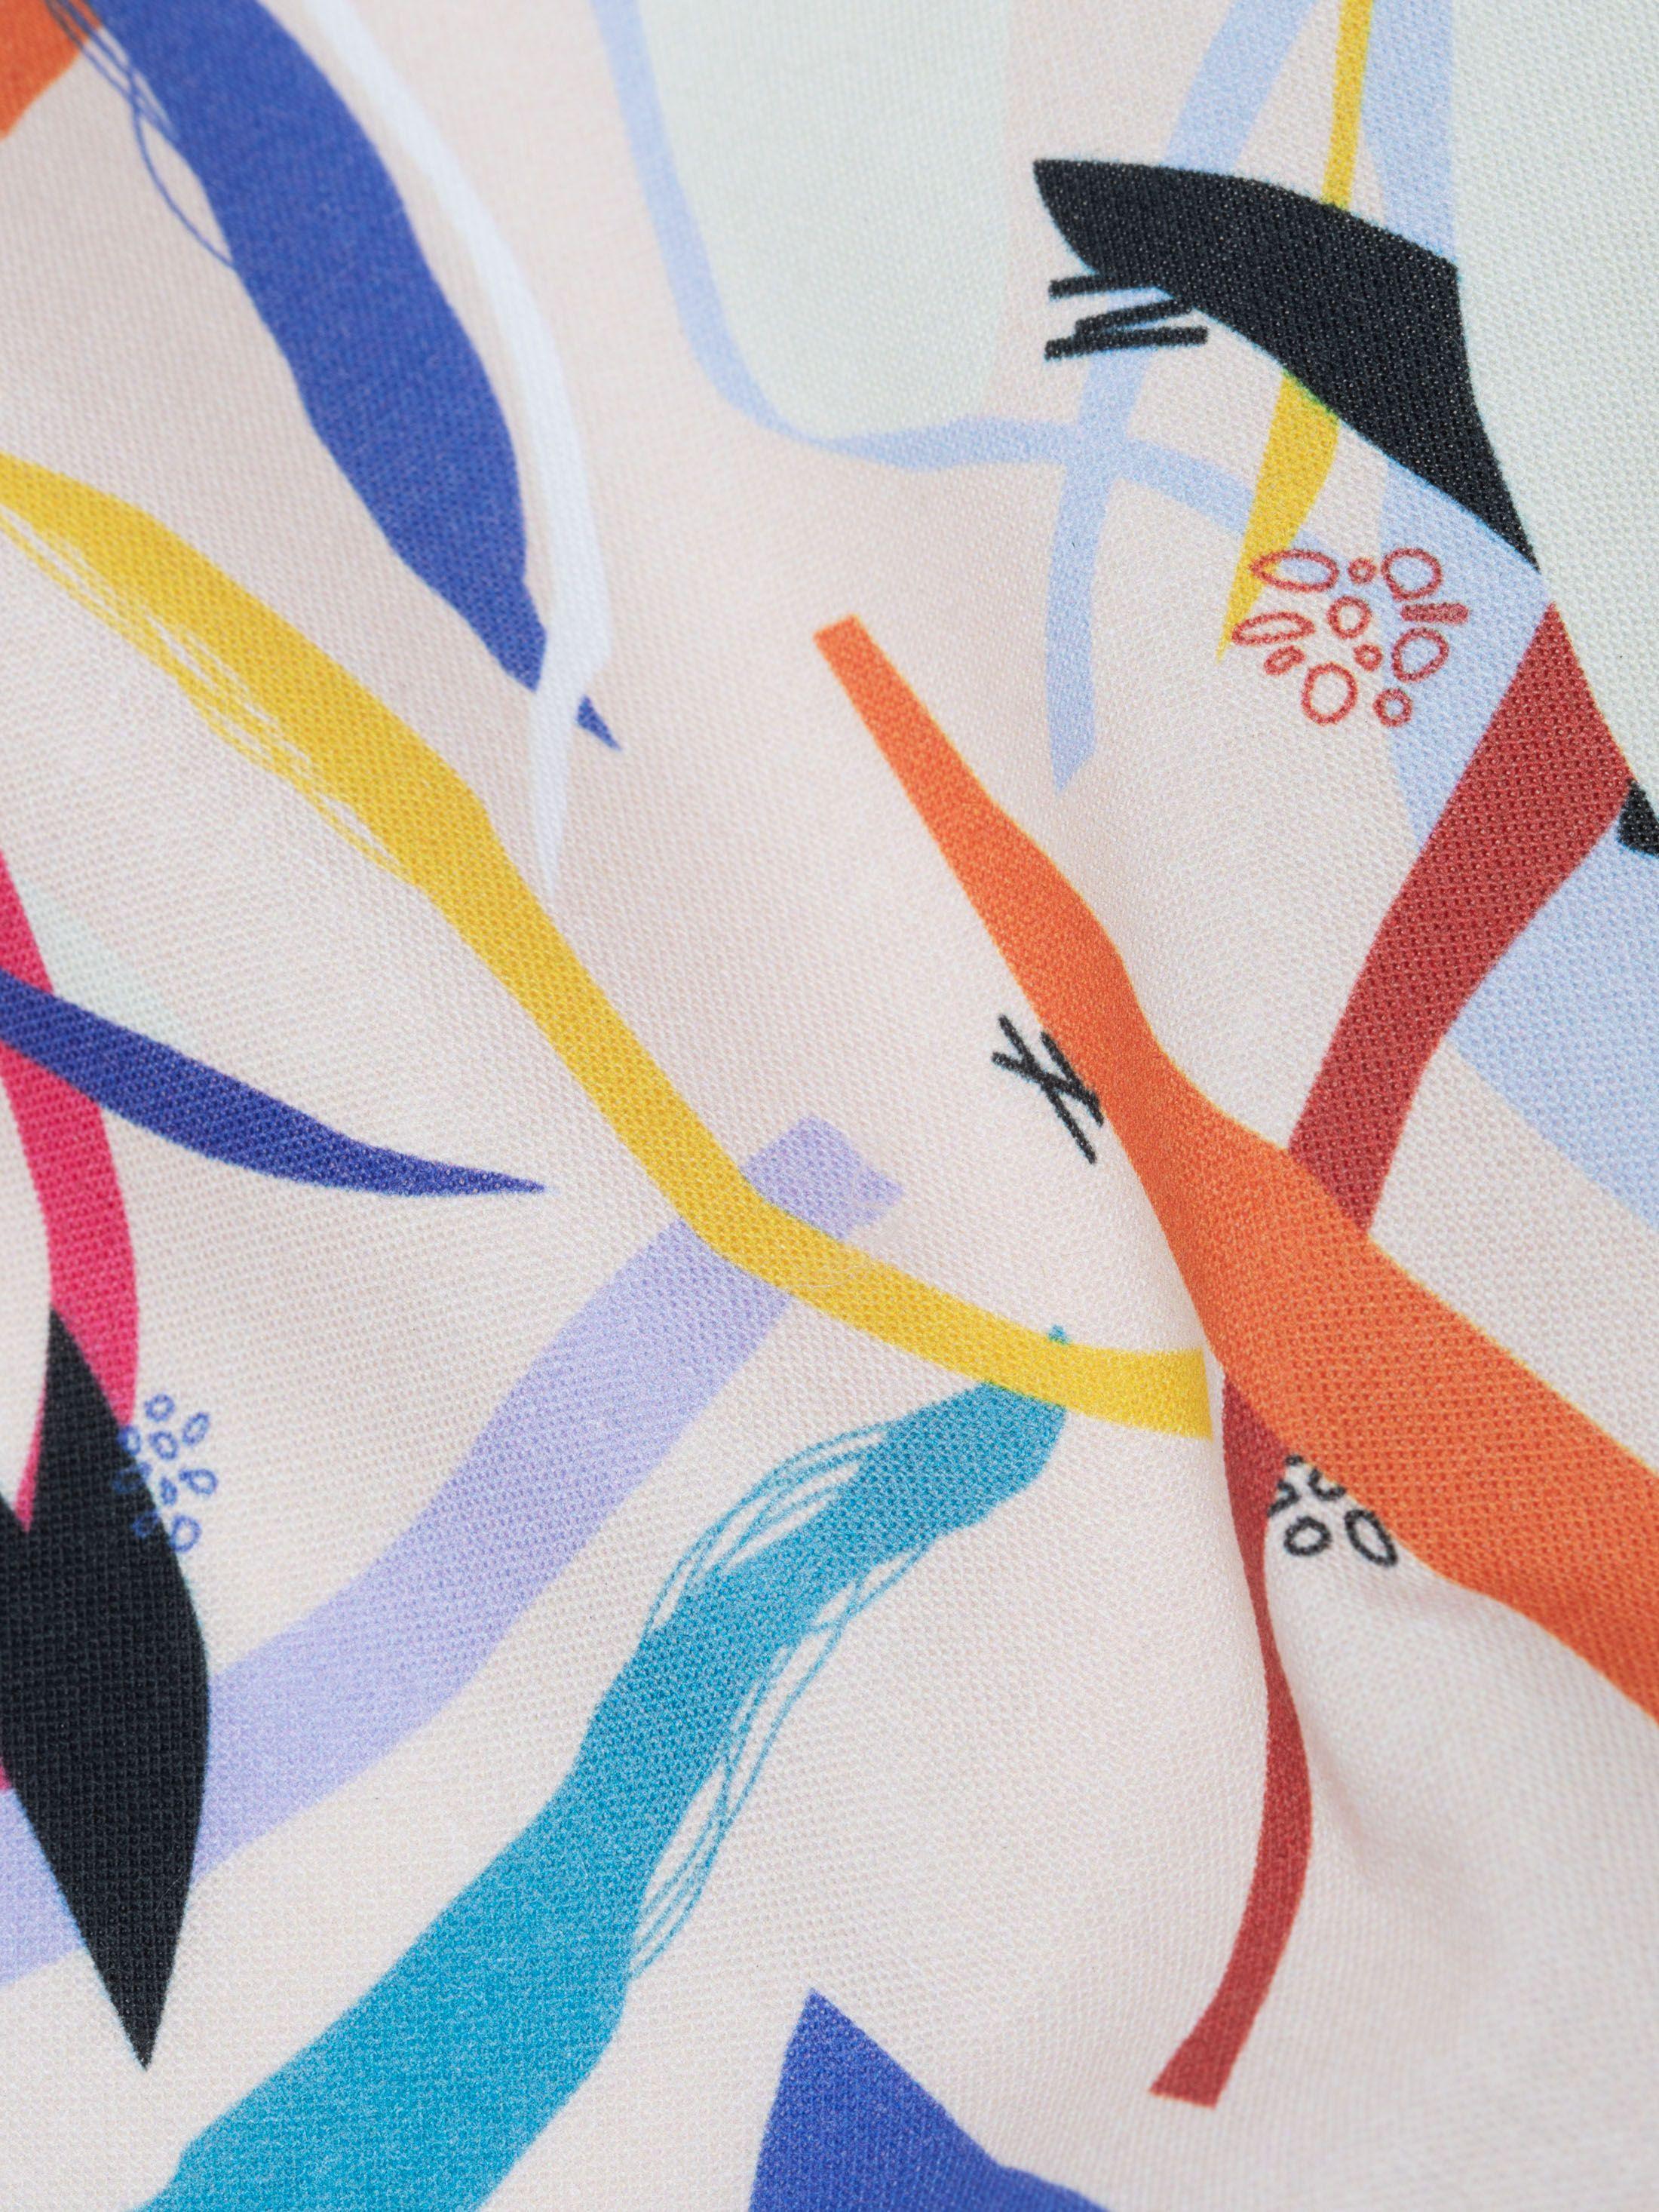 white Cotton Calico Fabric Lead image